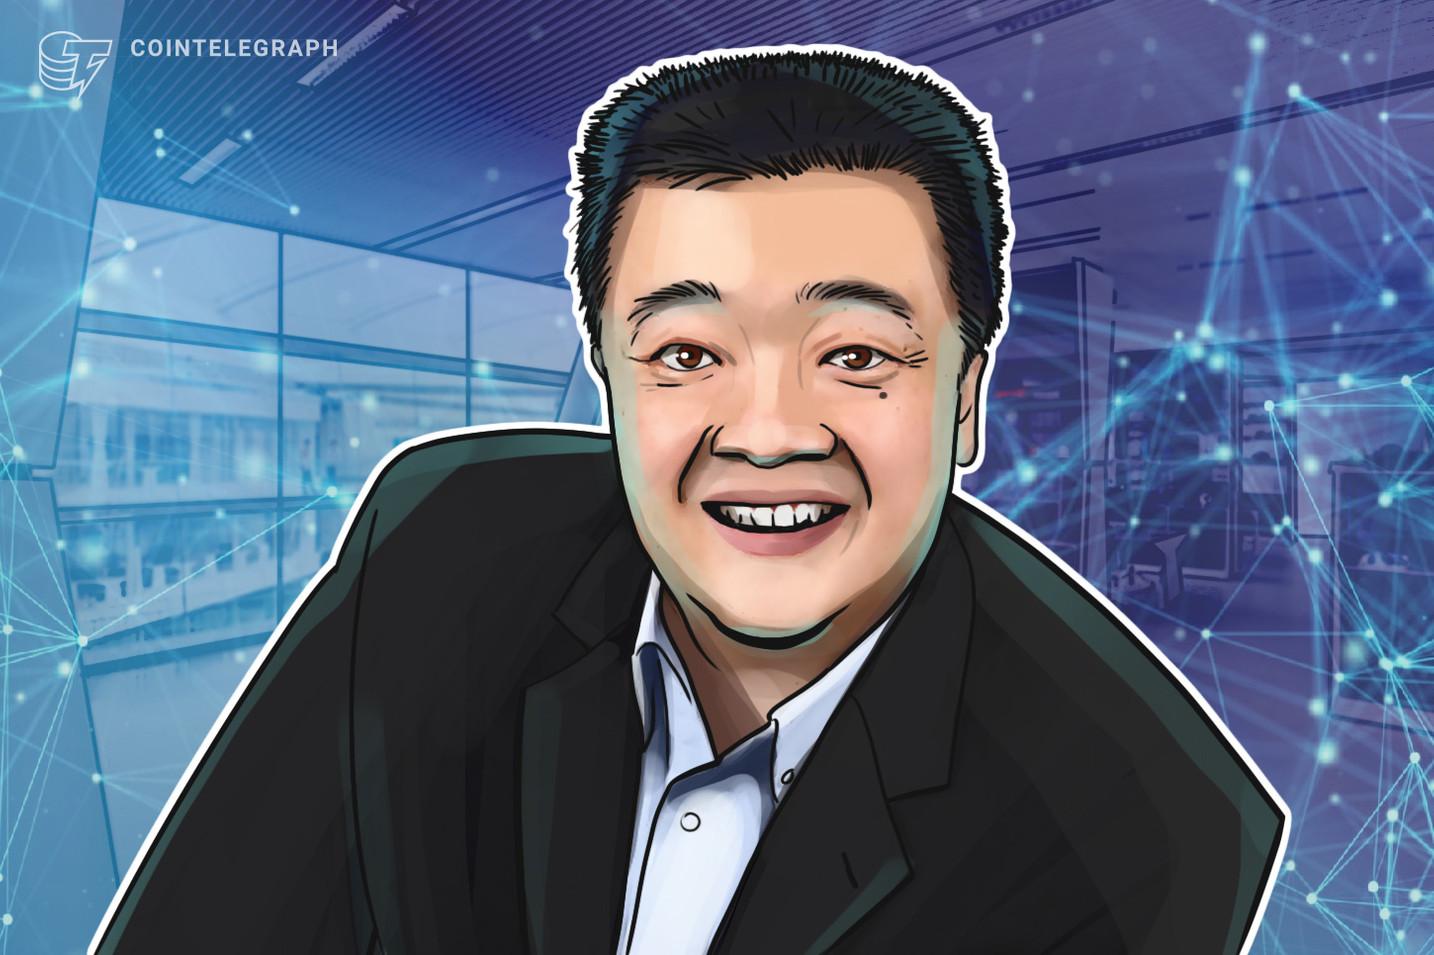 China's crackdown signals an oncoming crypto ban, Bobby Lee says